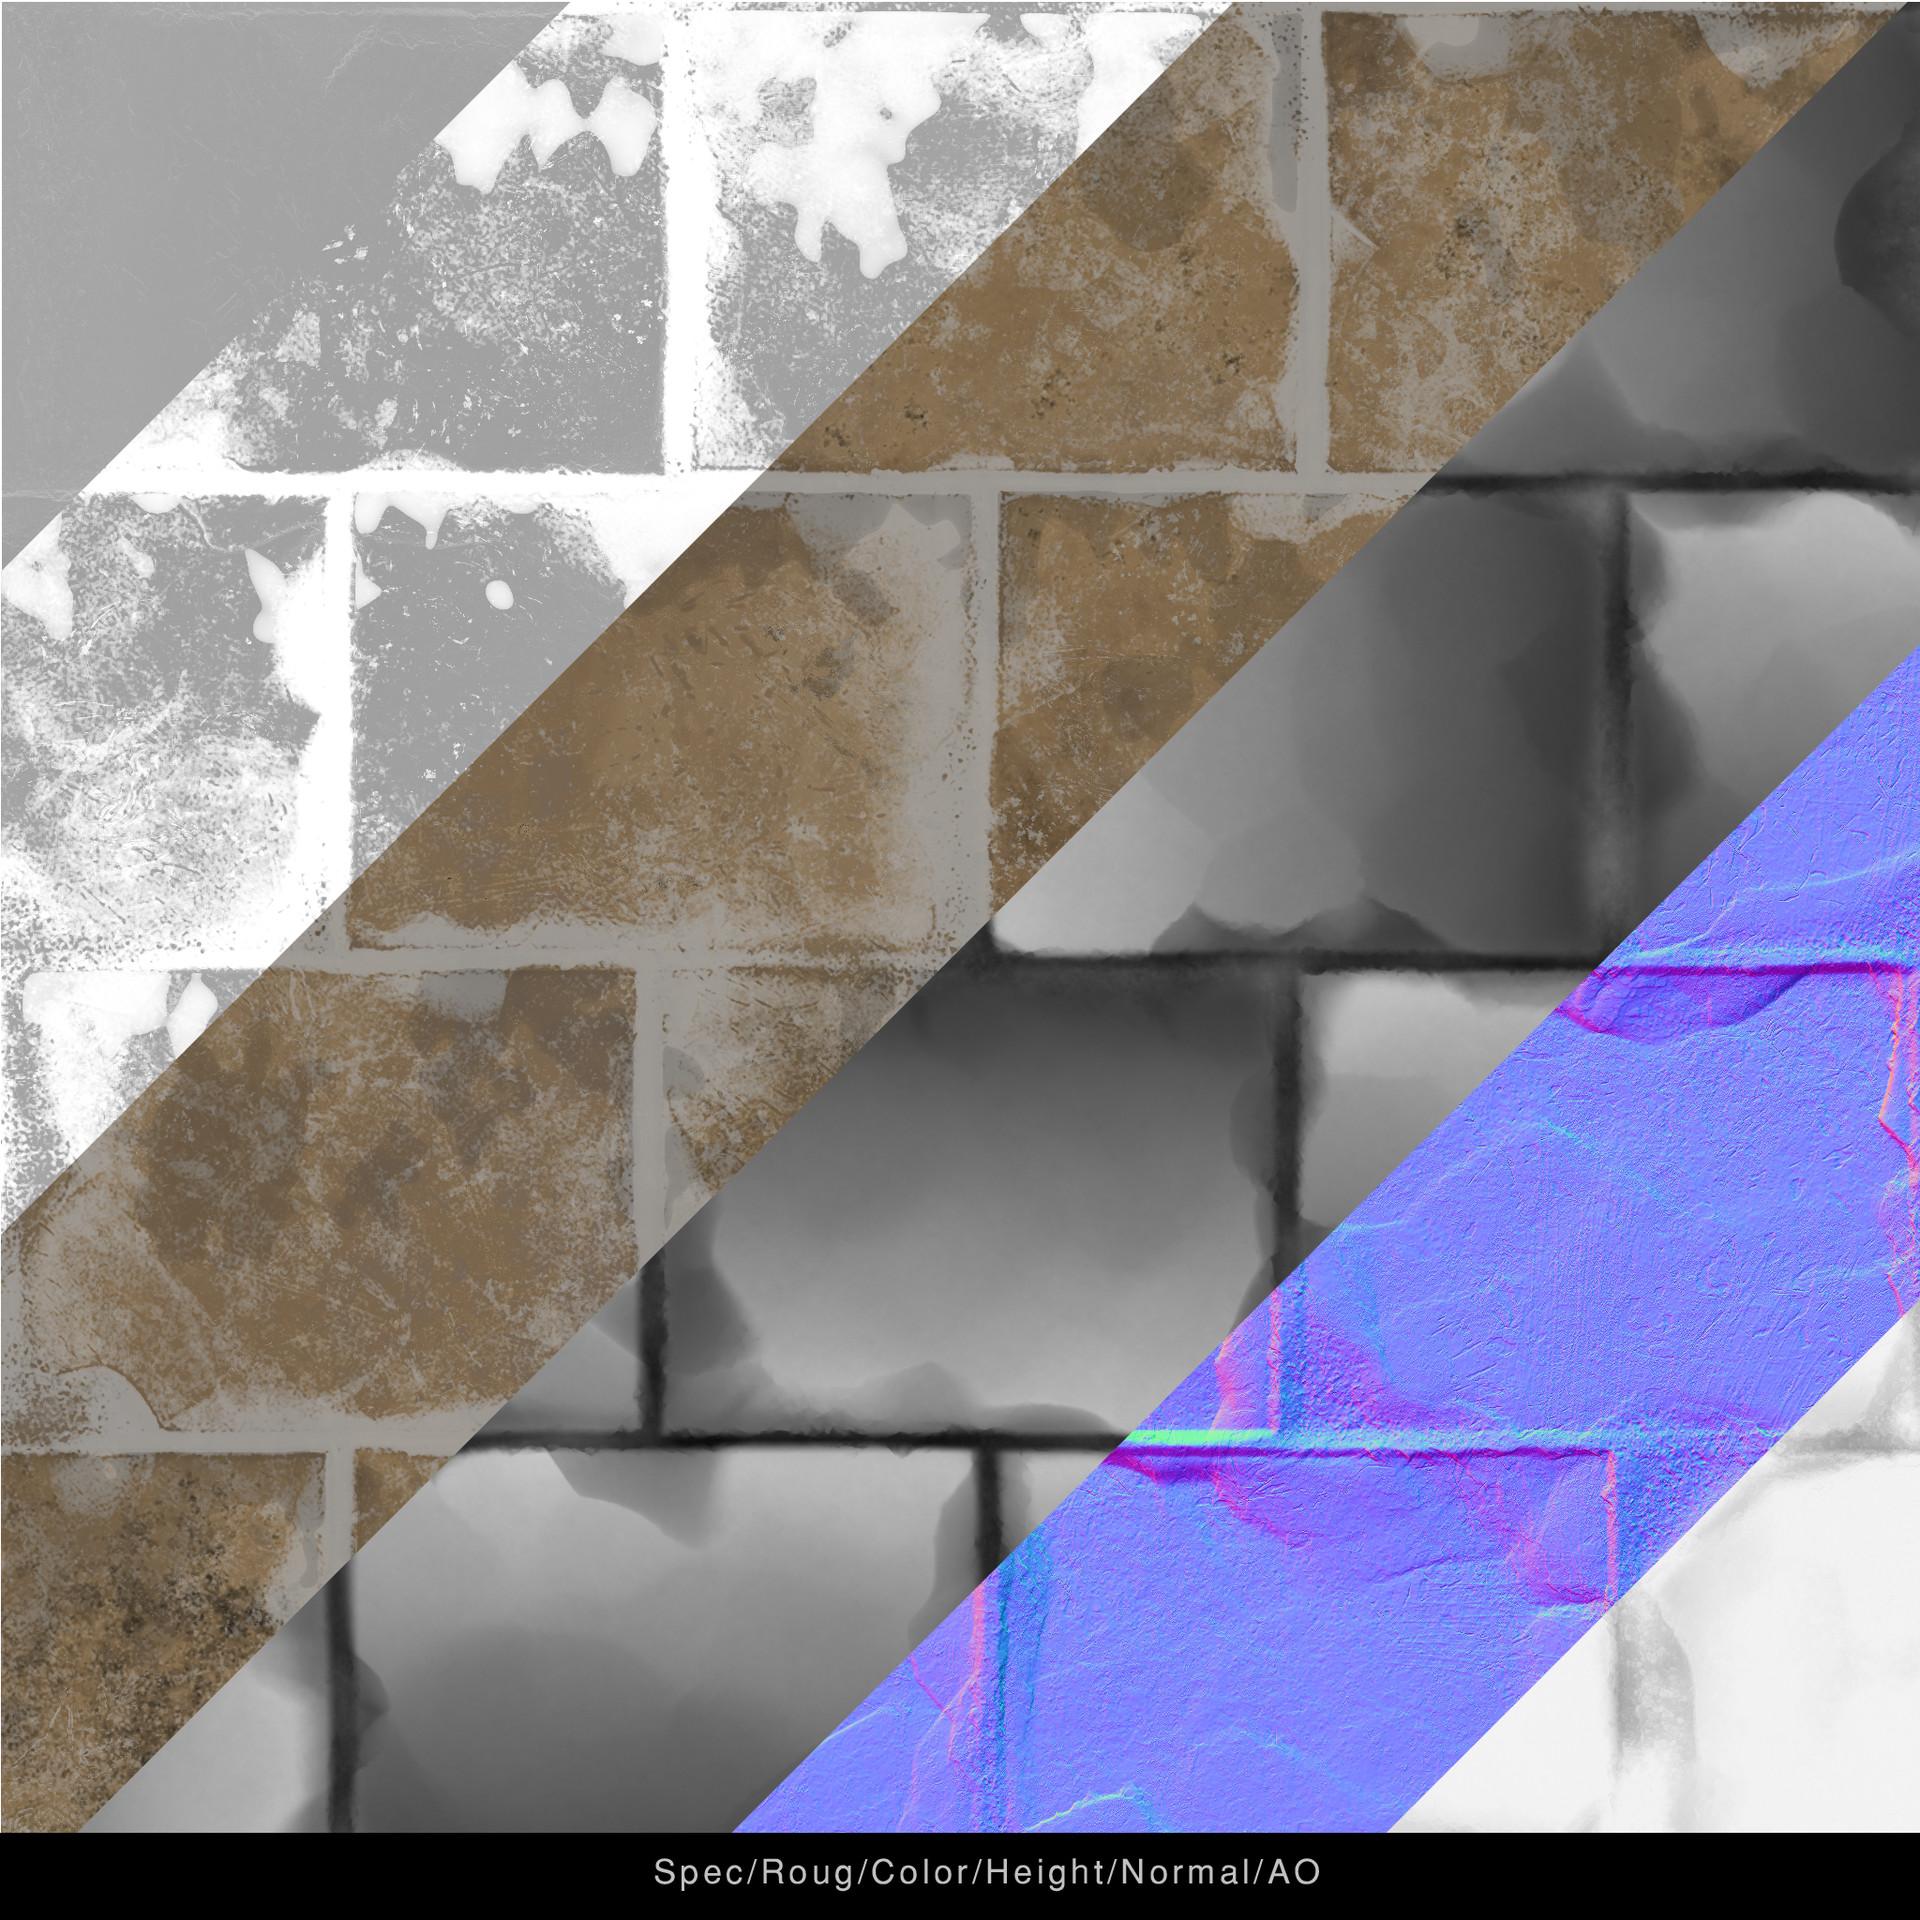 Jonas holmedal breakdown texture ancient brick plaster